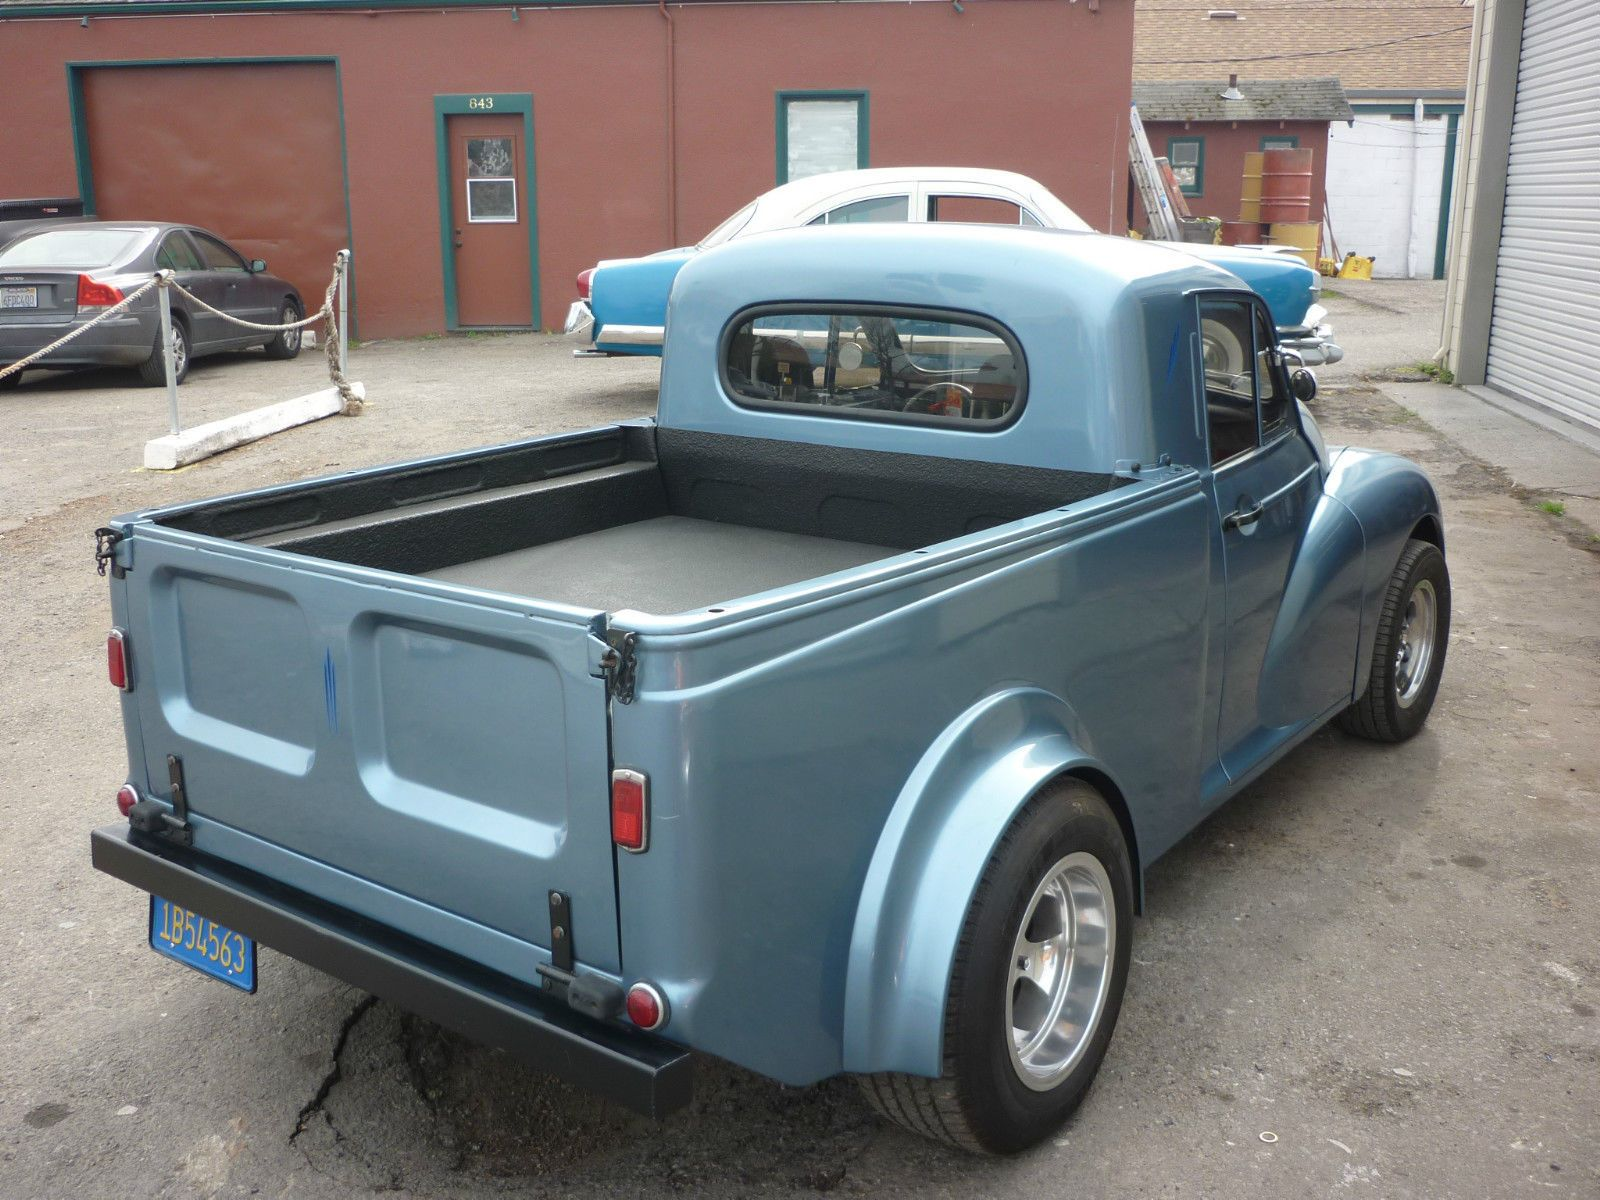 1959 Morris Minor Pickup Truck Hot Rod Custom Mini Austin Turbo